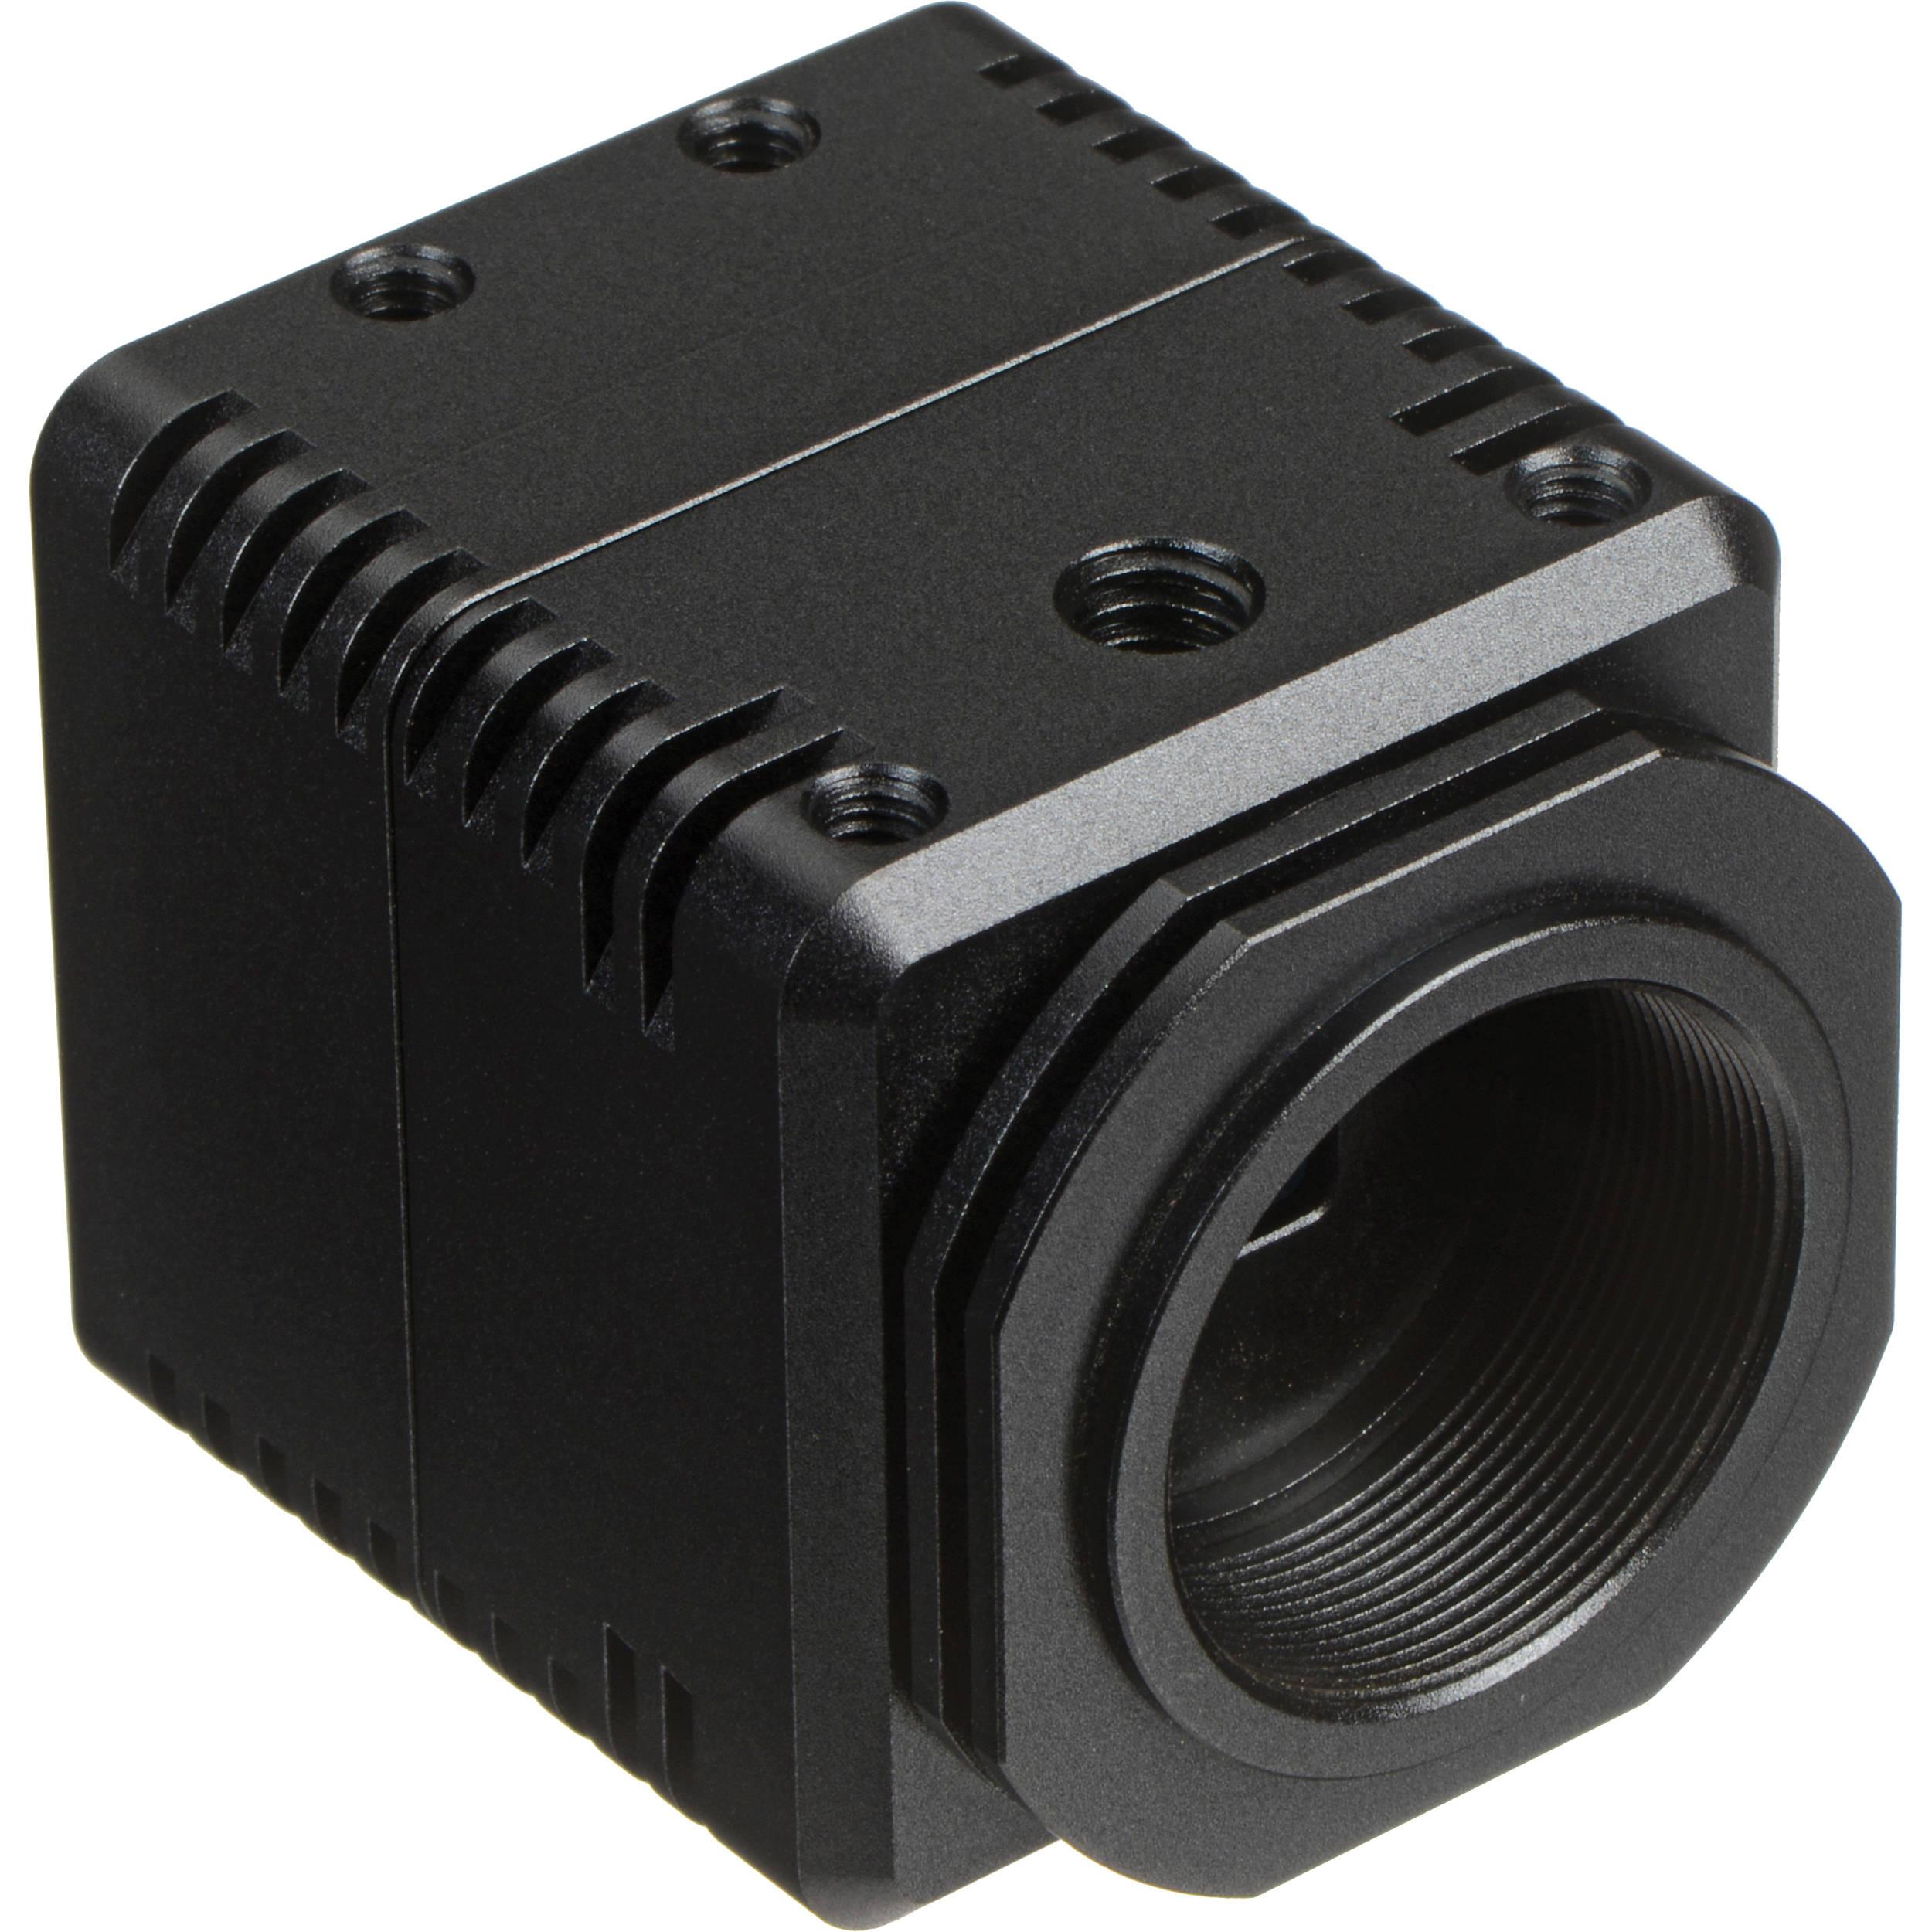 » C. Mount Camera | CCTV IP Camera, DVR & Analog CCTV Cameras.